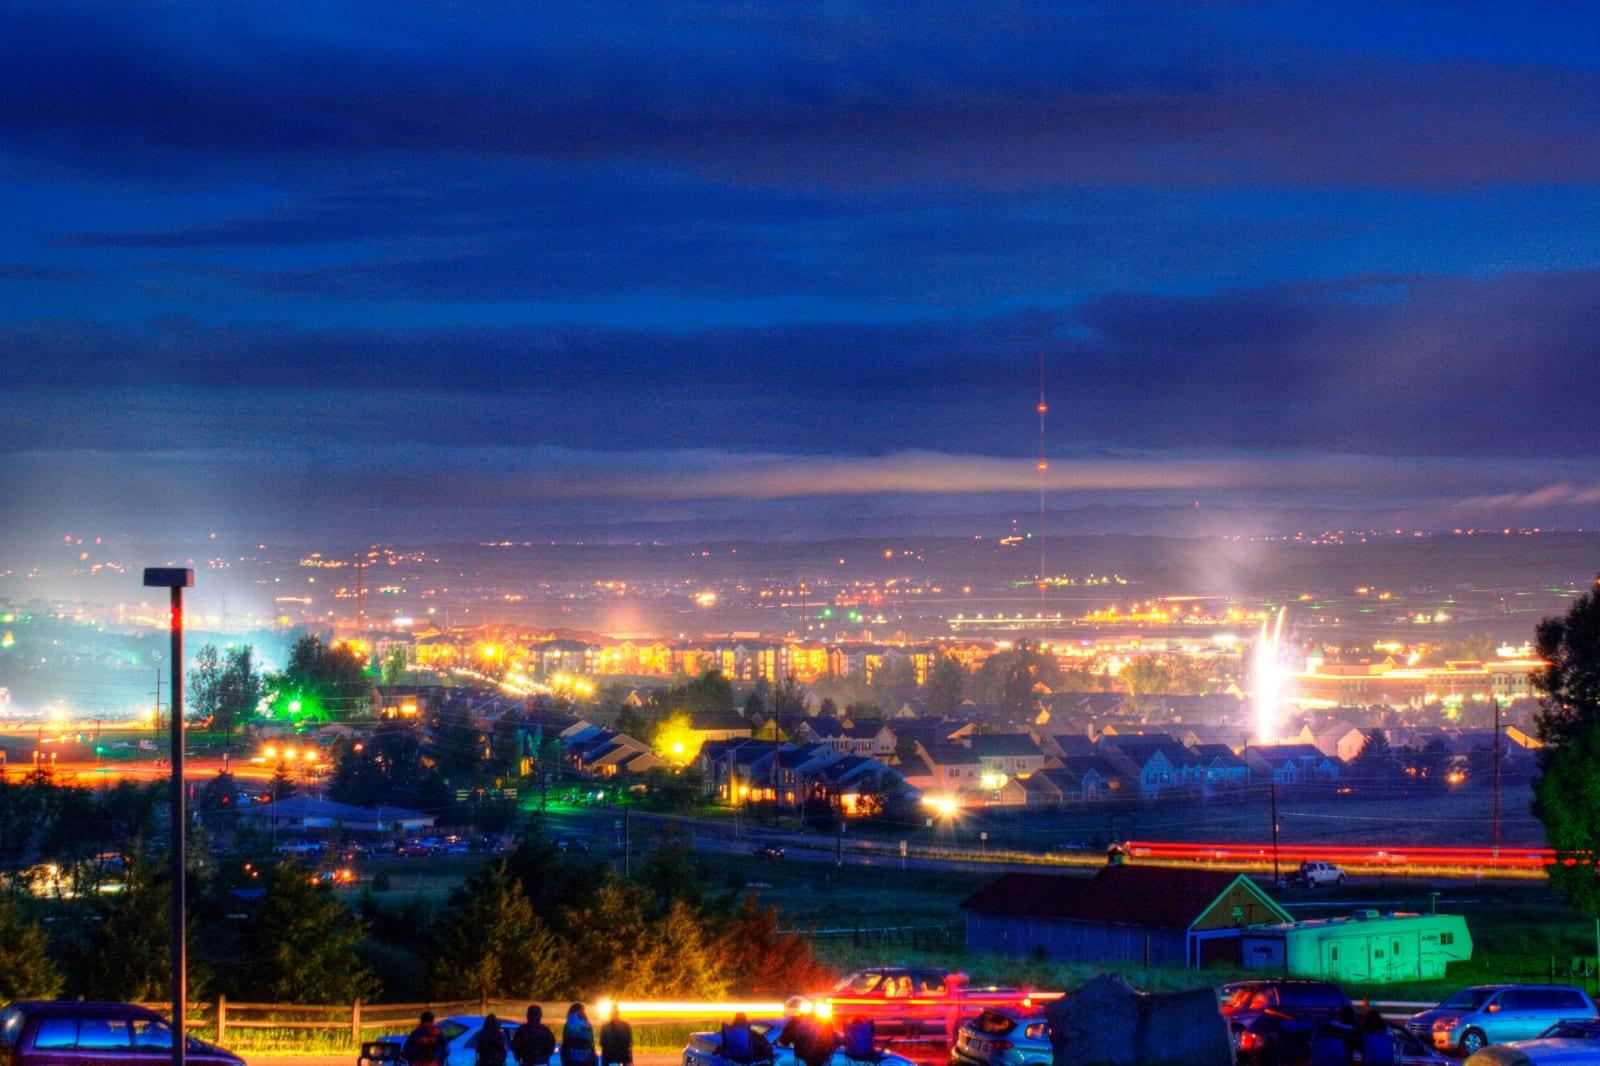 Parker Colorado July 4th Fireworks Night Sky